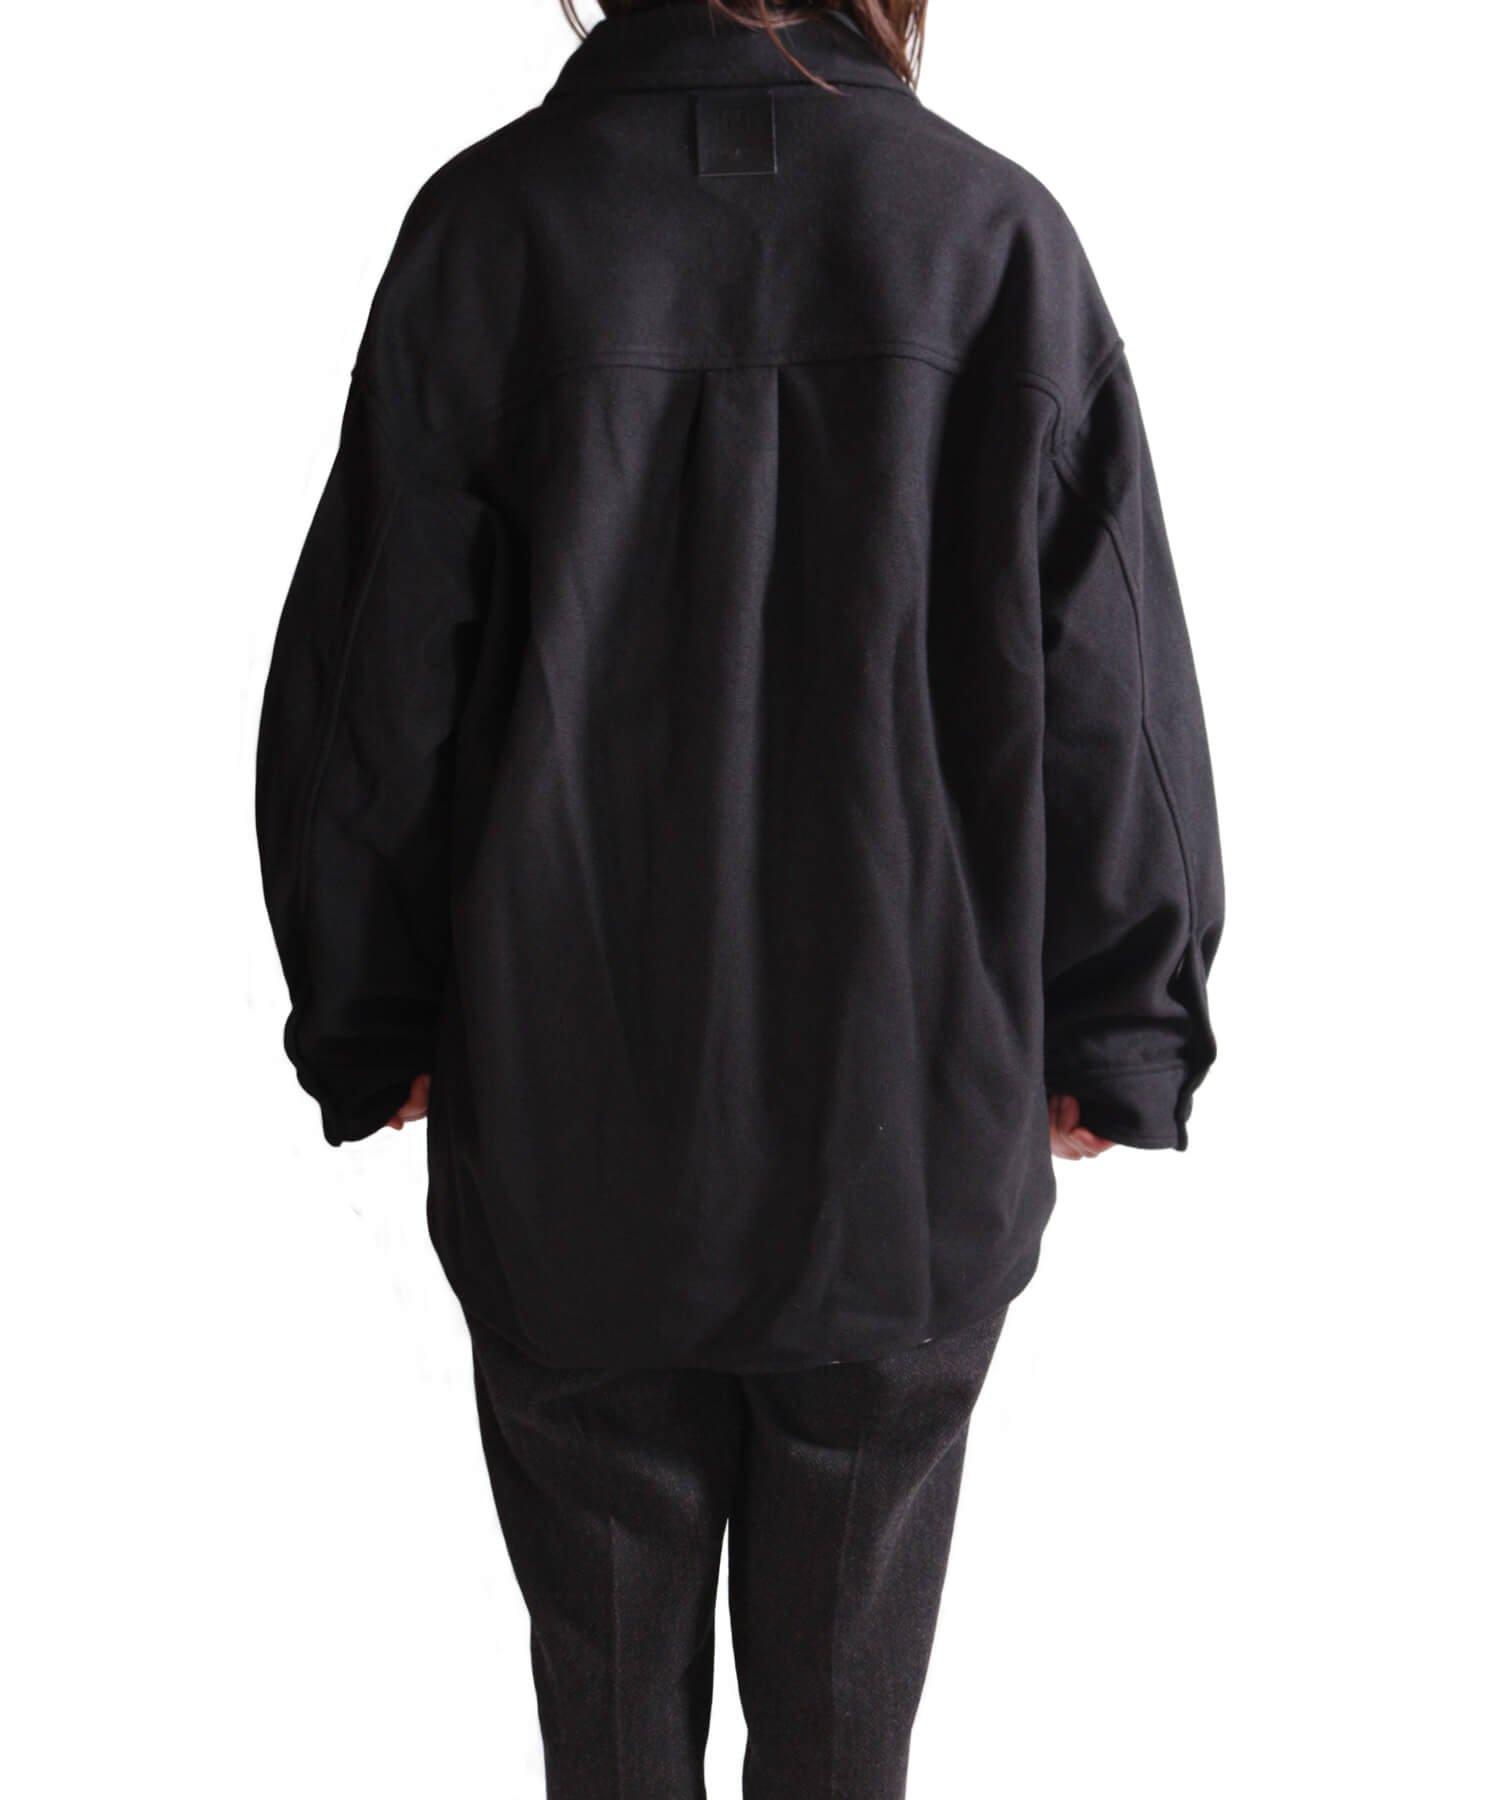 NIL DUE / NIL UN TOKYO / ニル デュエ / ニル アン トーキョー | LEATHER TAG SHIRTS JACKET (BLACK) 商品画像16